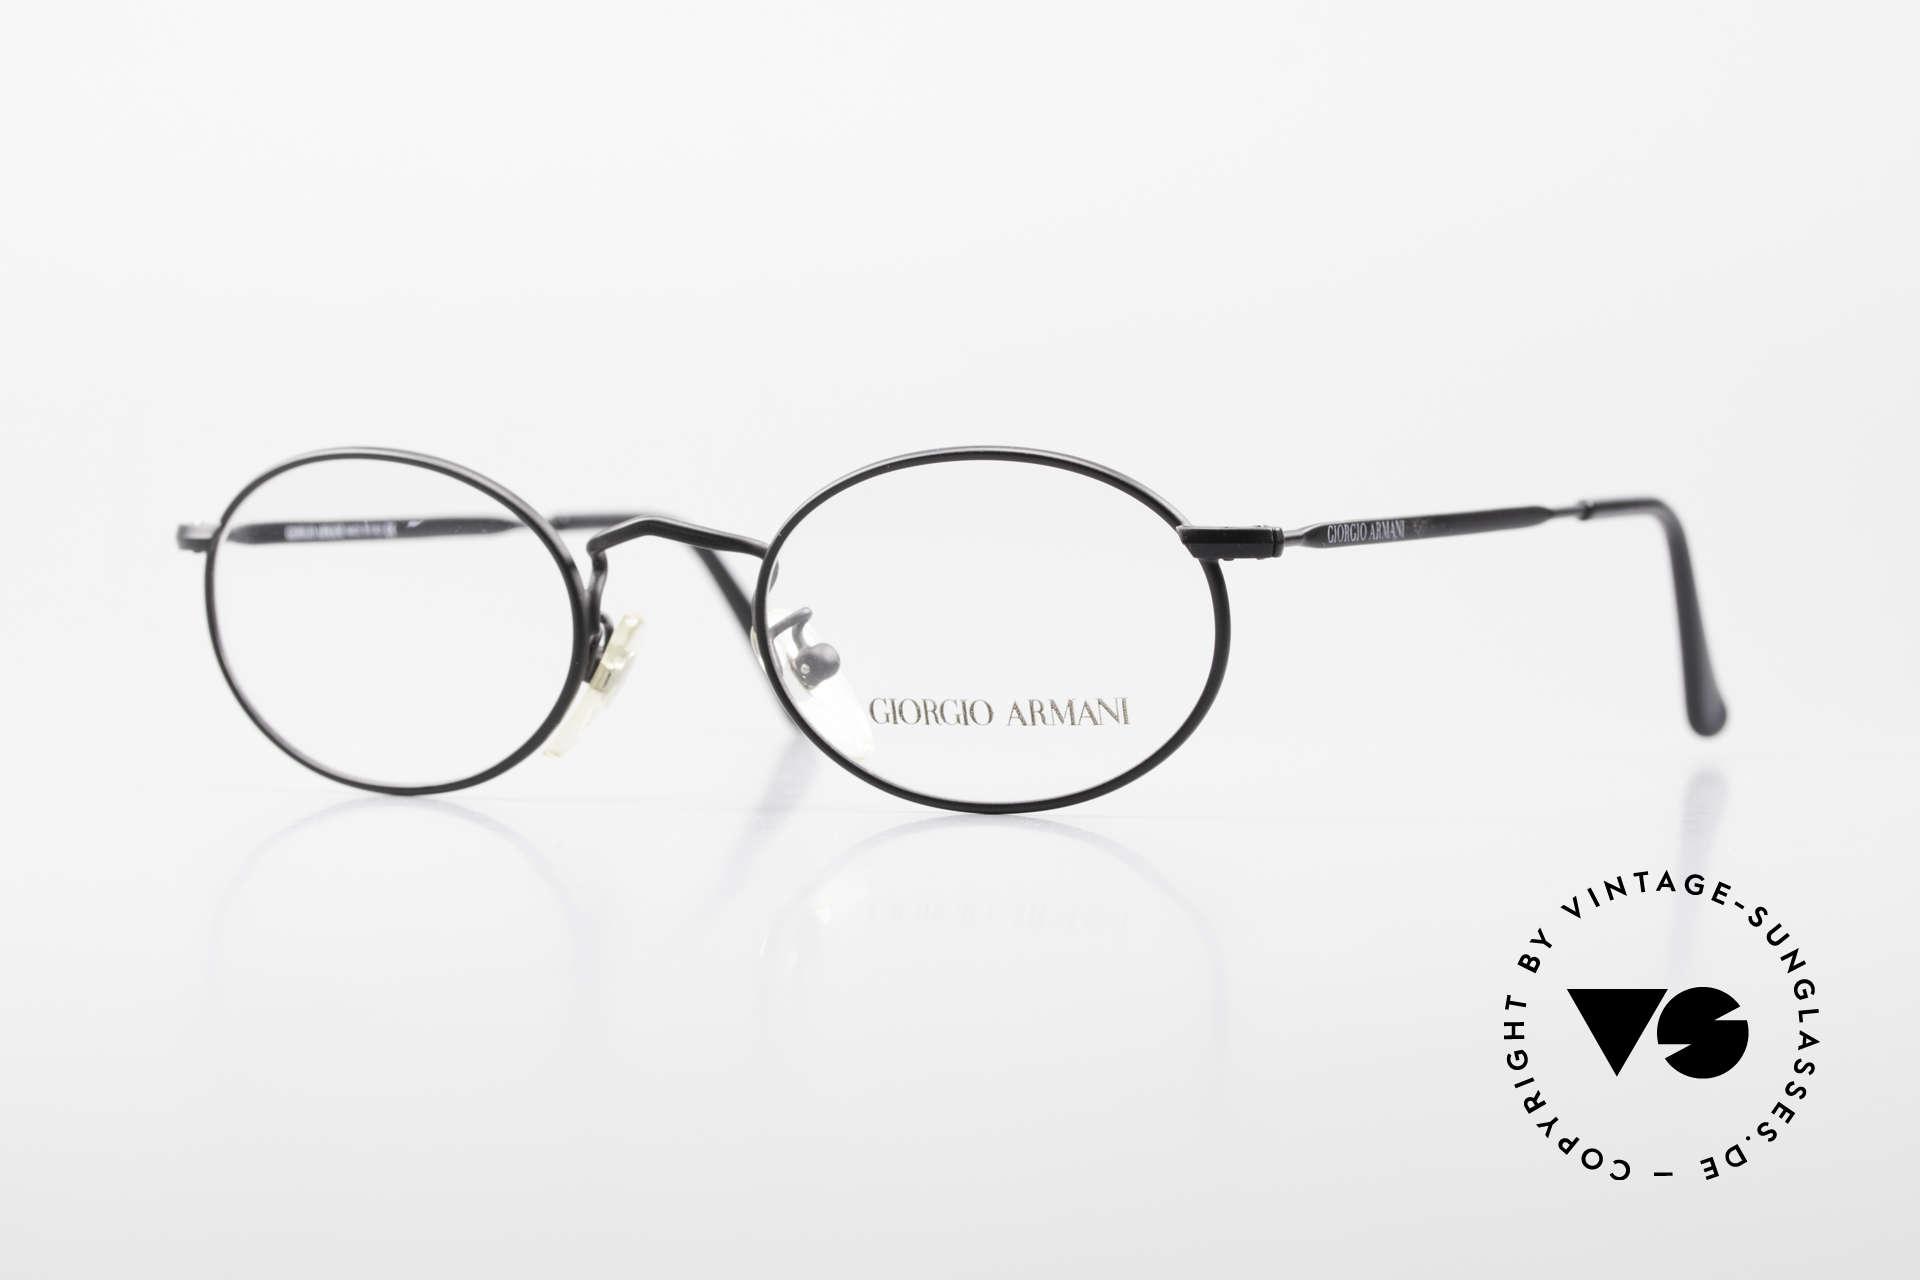 Giorgio Armani 131 Vintage Eyeglasses Oval Frame, oval GIORGIO ARMANI vintage designer eyeglasses, Made for Men and Women